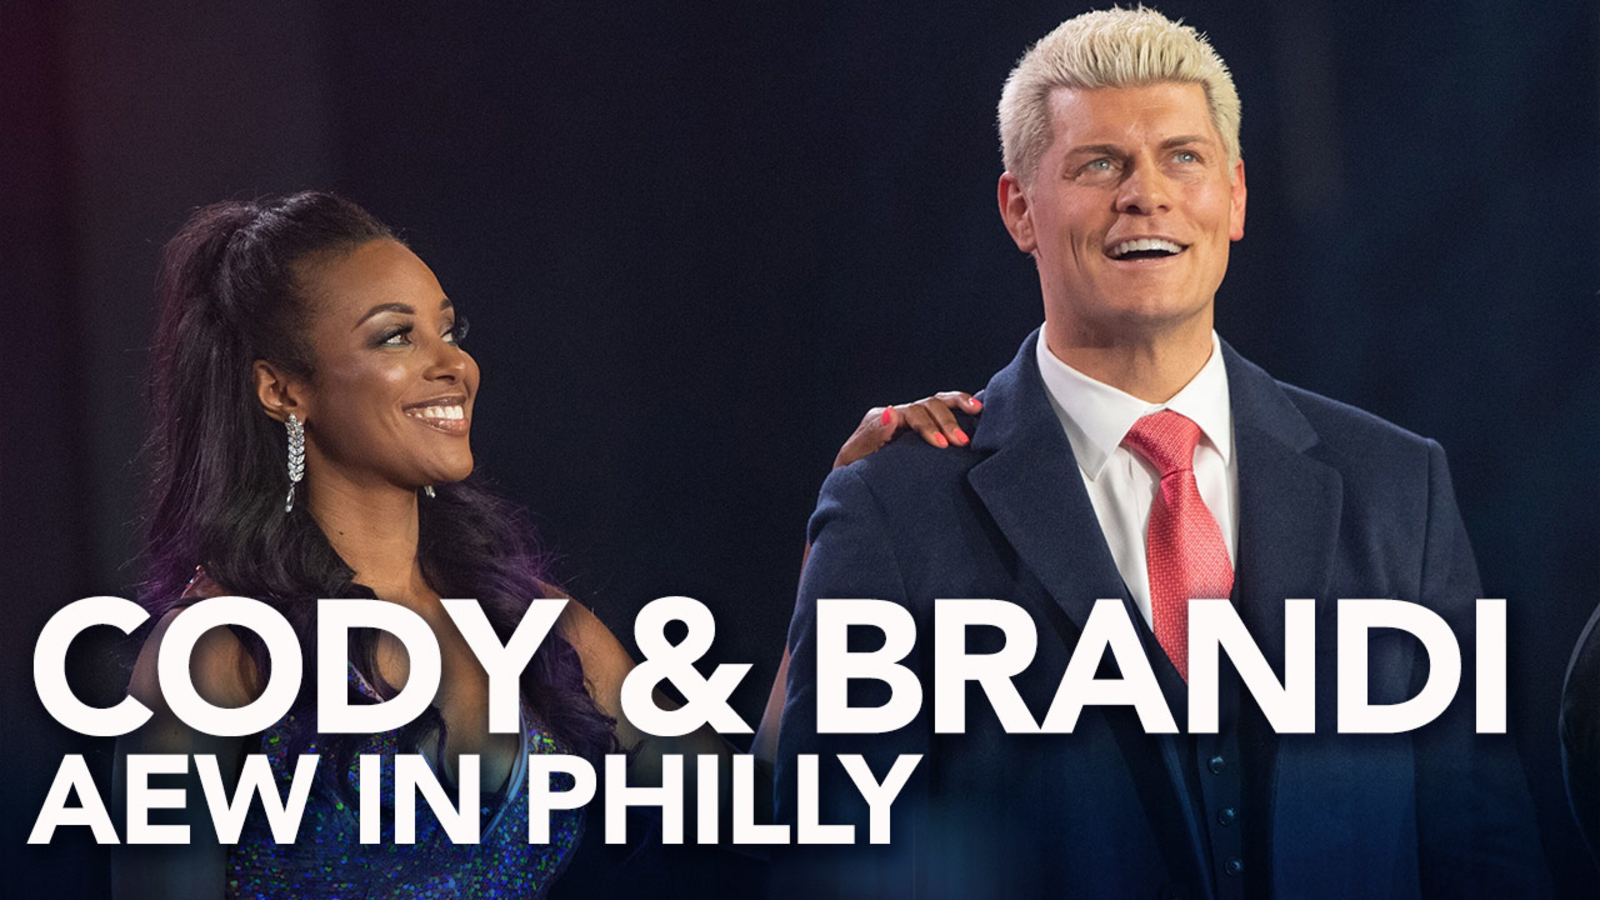 Cody, Brandi Rhodes bring AEW to Philadelphia